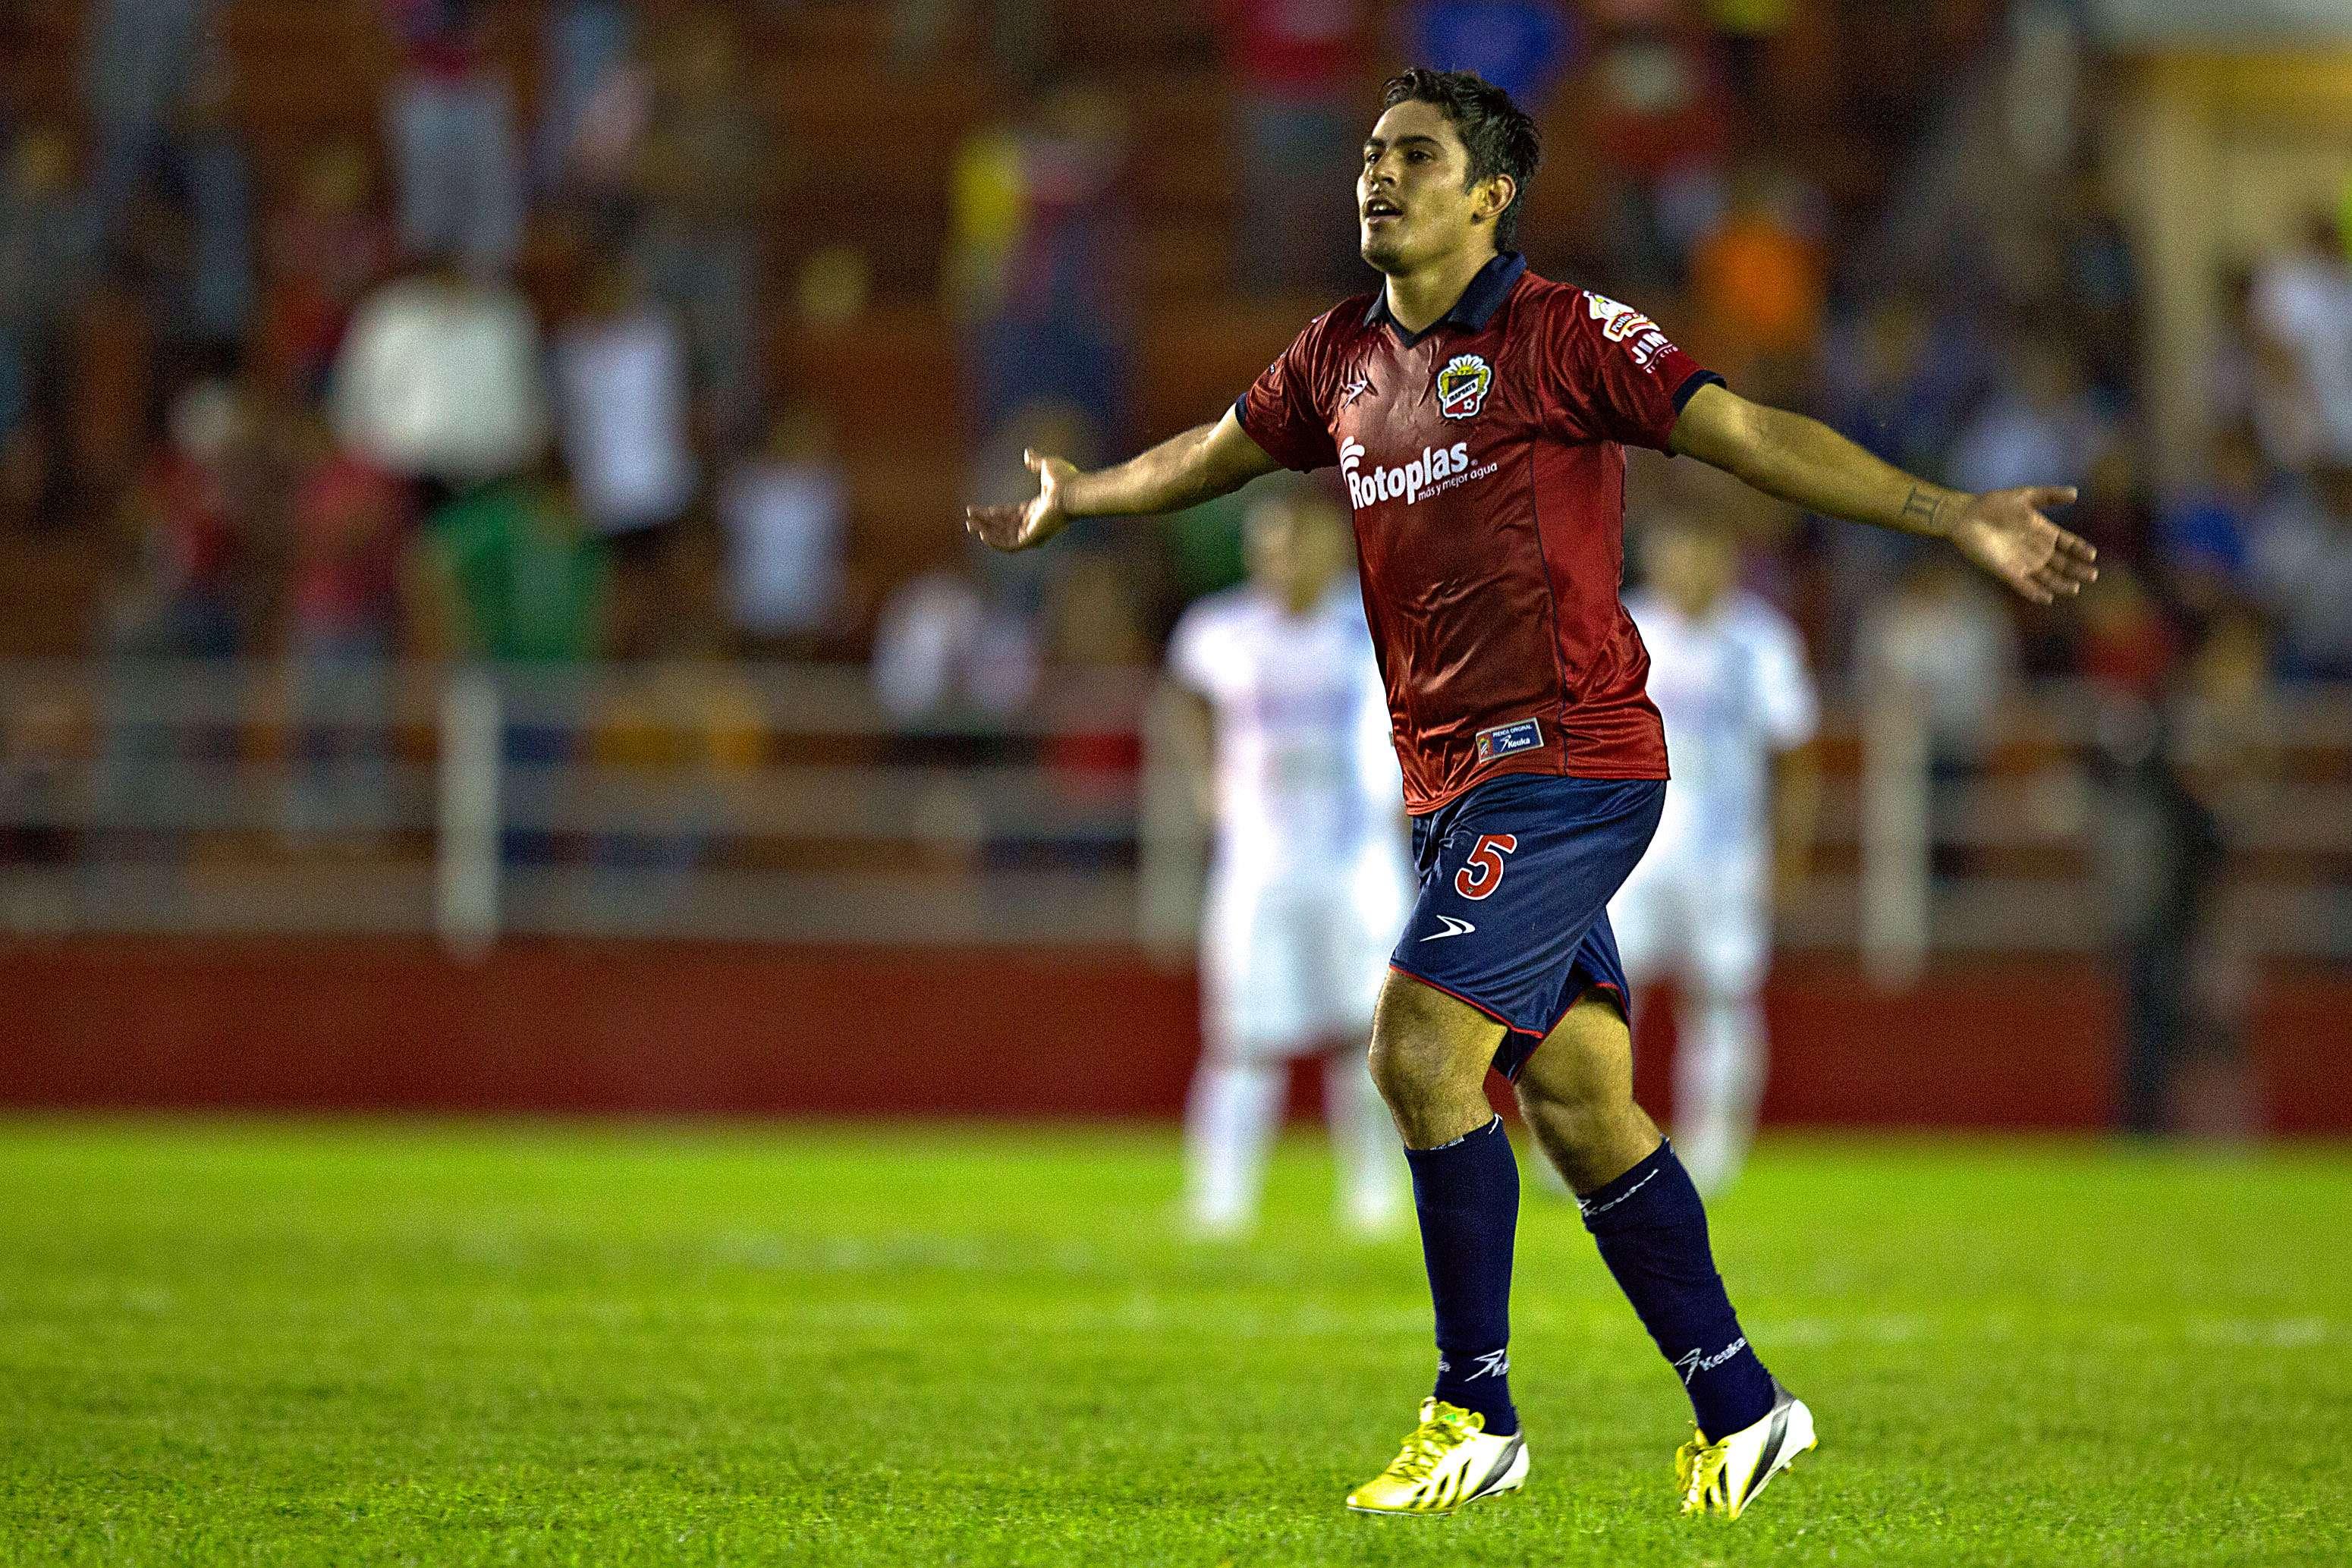 "Marco Tovar hizo el primer gol de los ""freseros"". Foto: Imago 7"